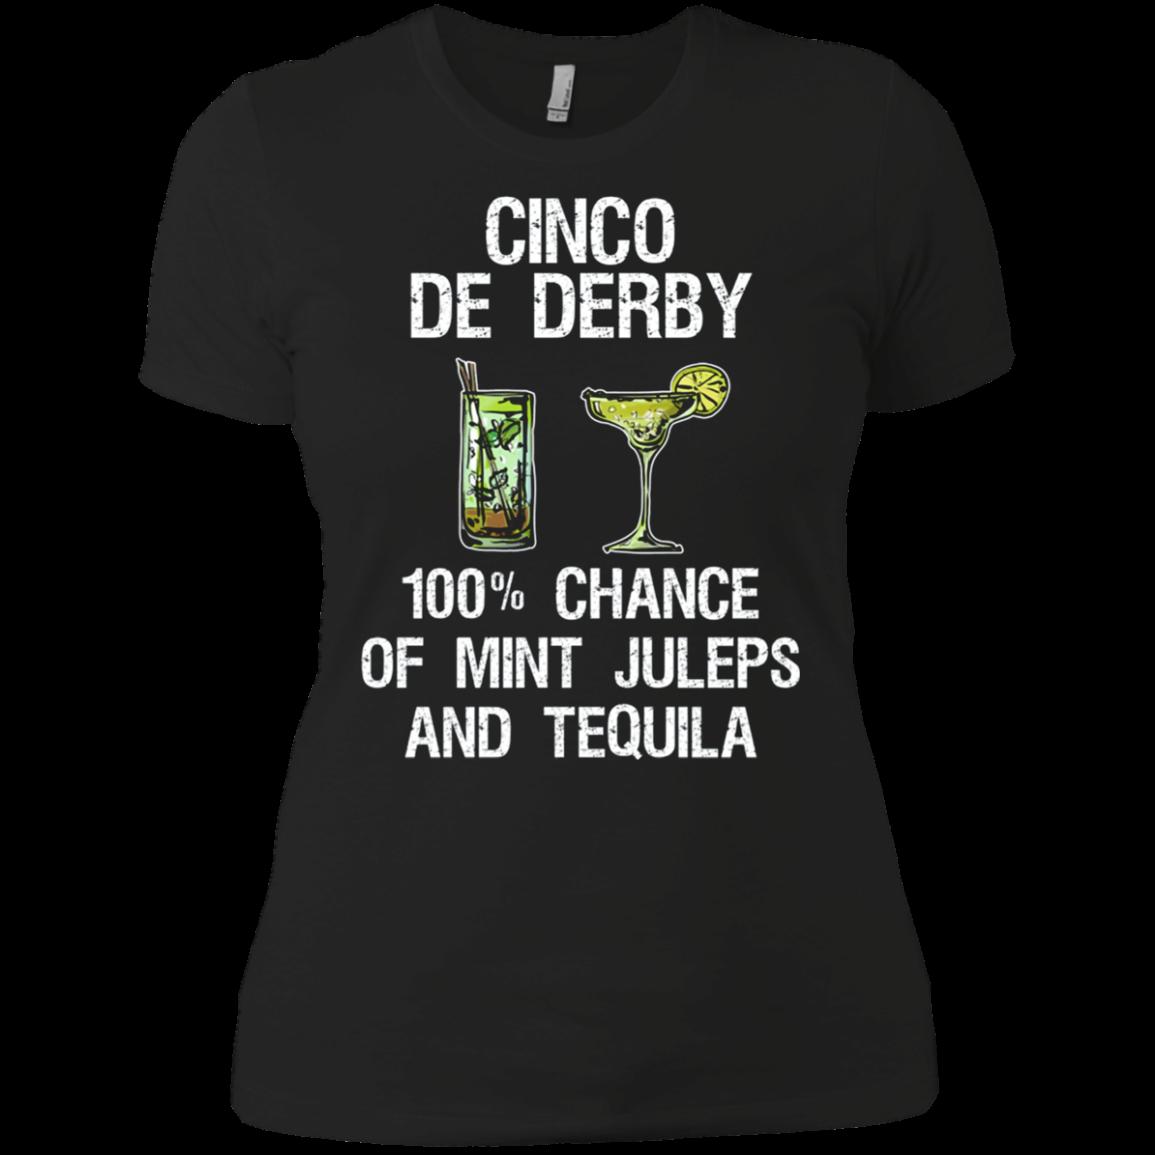 Cinco de Derby - Funny Kentucky Drink Shirt Ladies' Boyfriend shirt Men